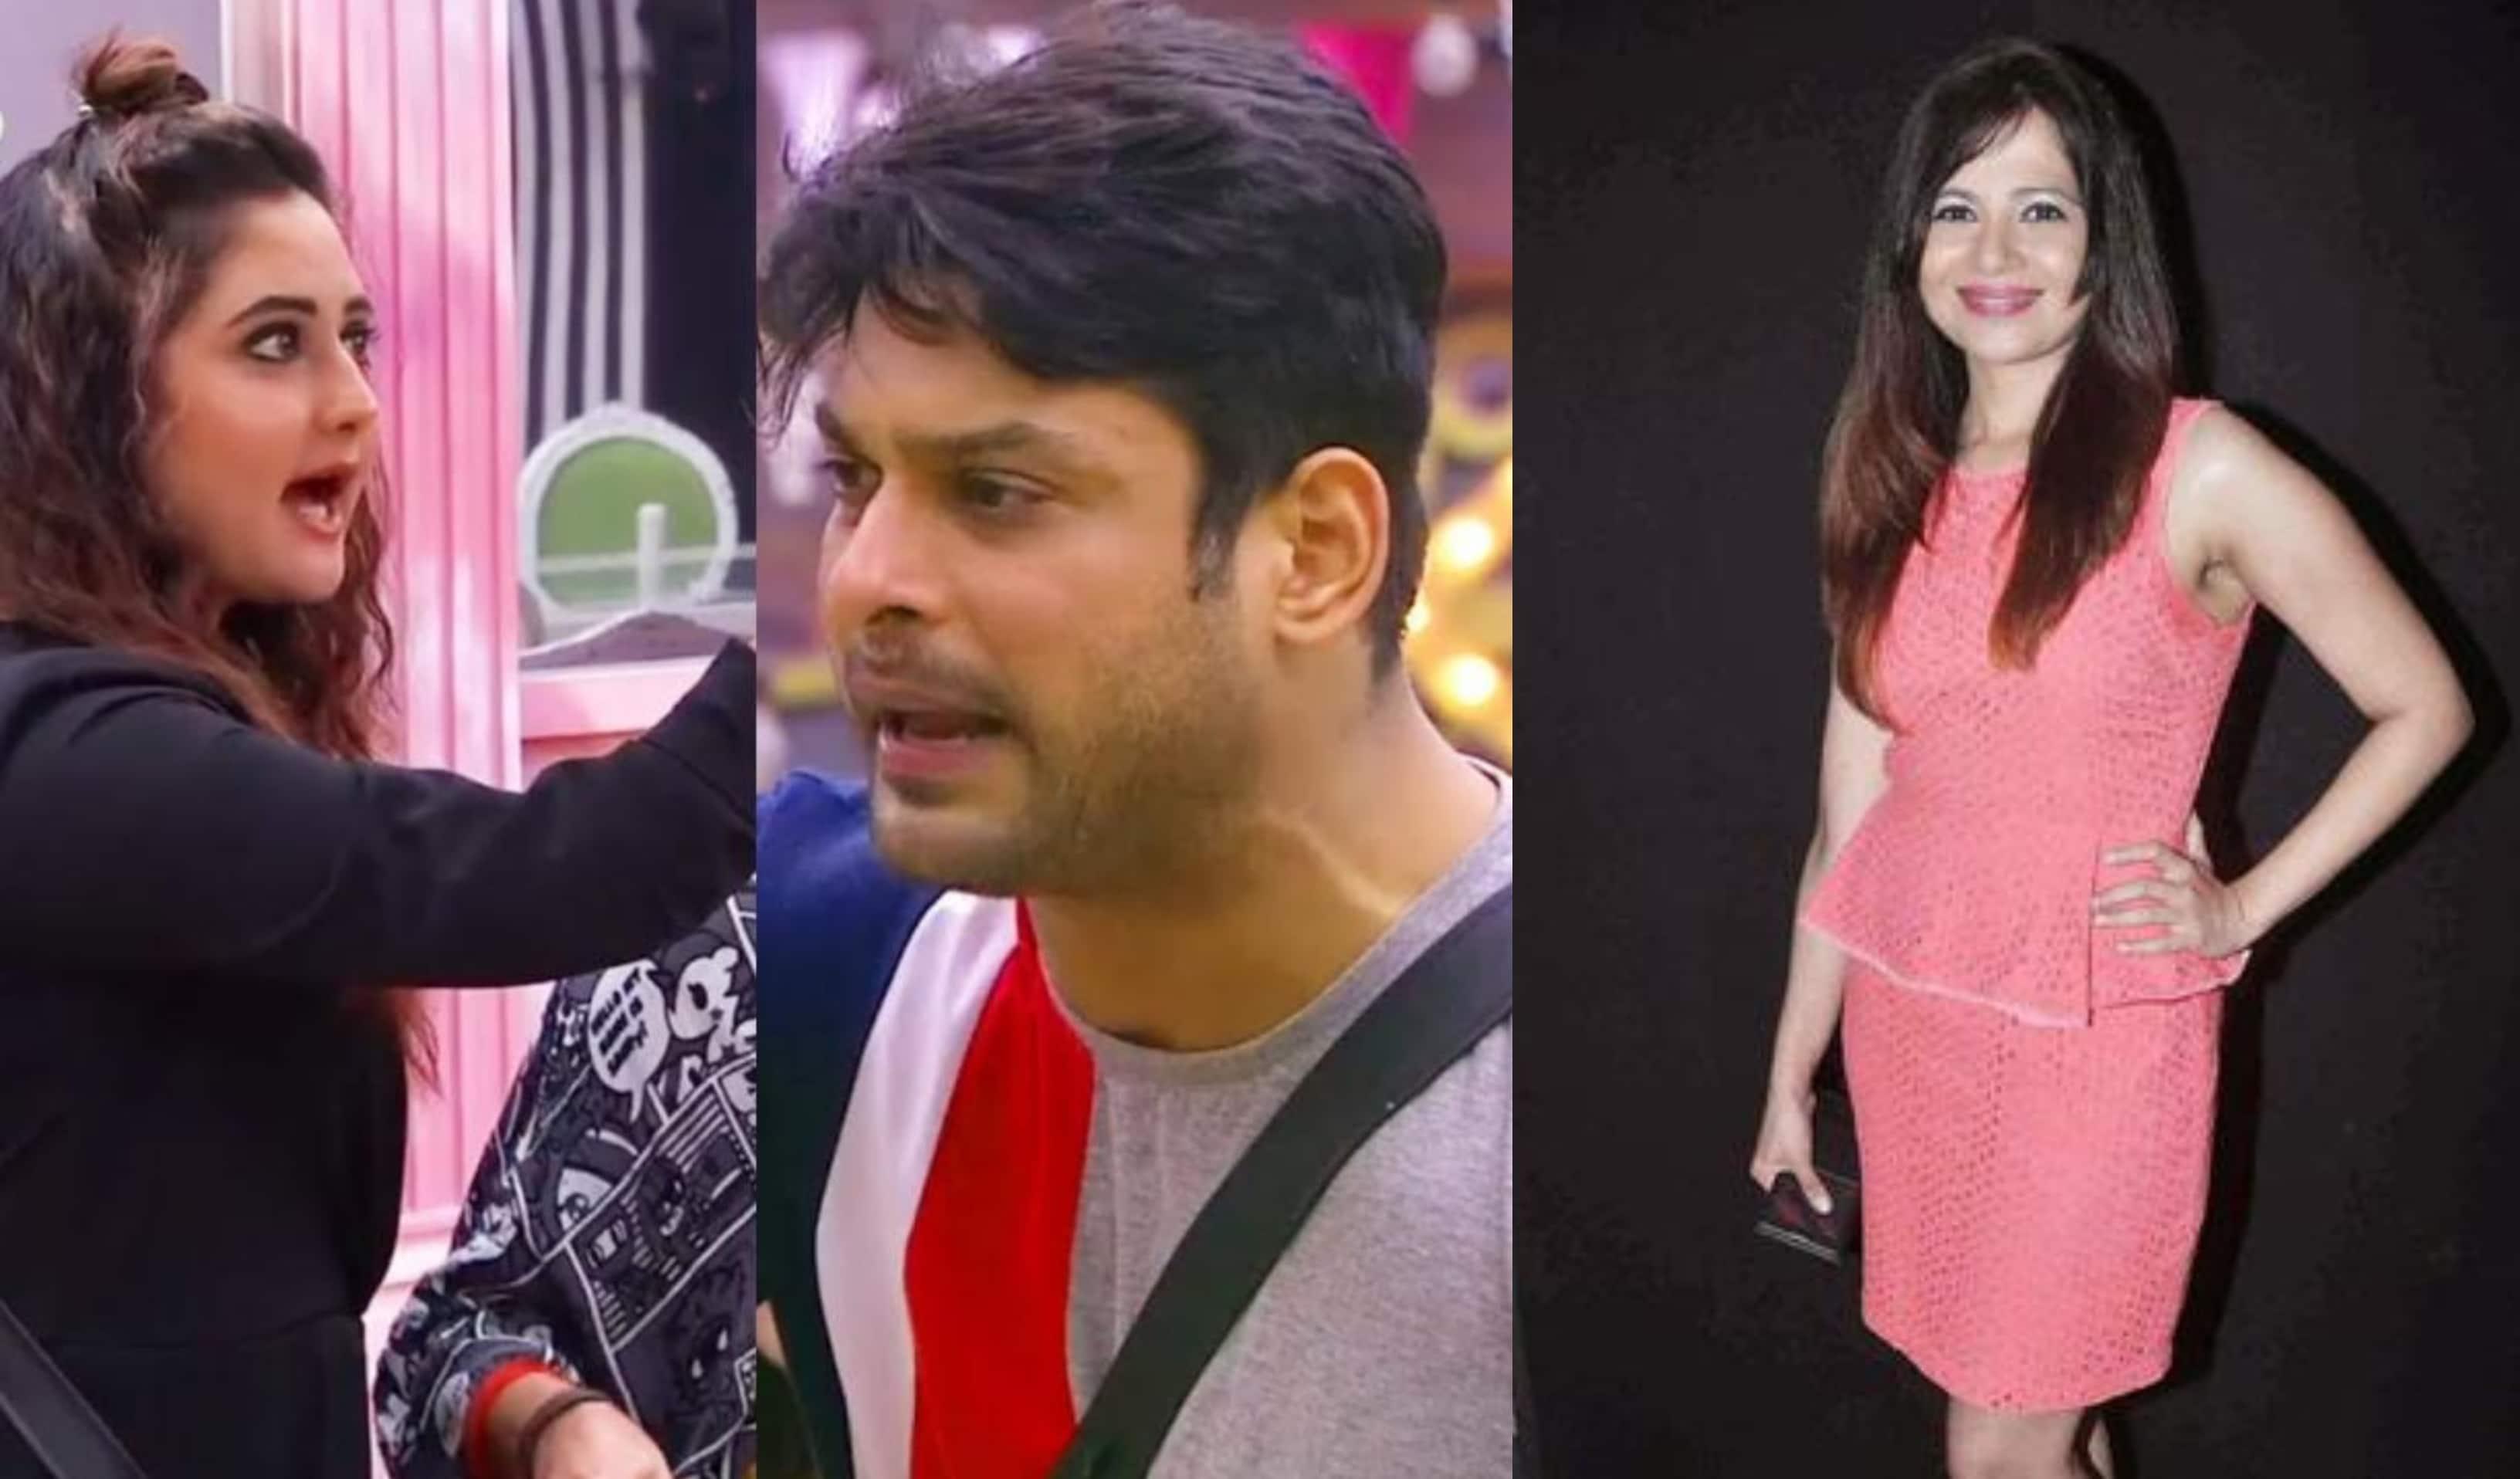 Bigg Boss 13: Siddharth Shukla's Close Friend Model Natasha Singh Bashes Rashami Desai For Calling Him 'Namard'